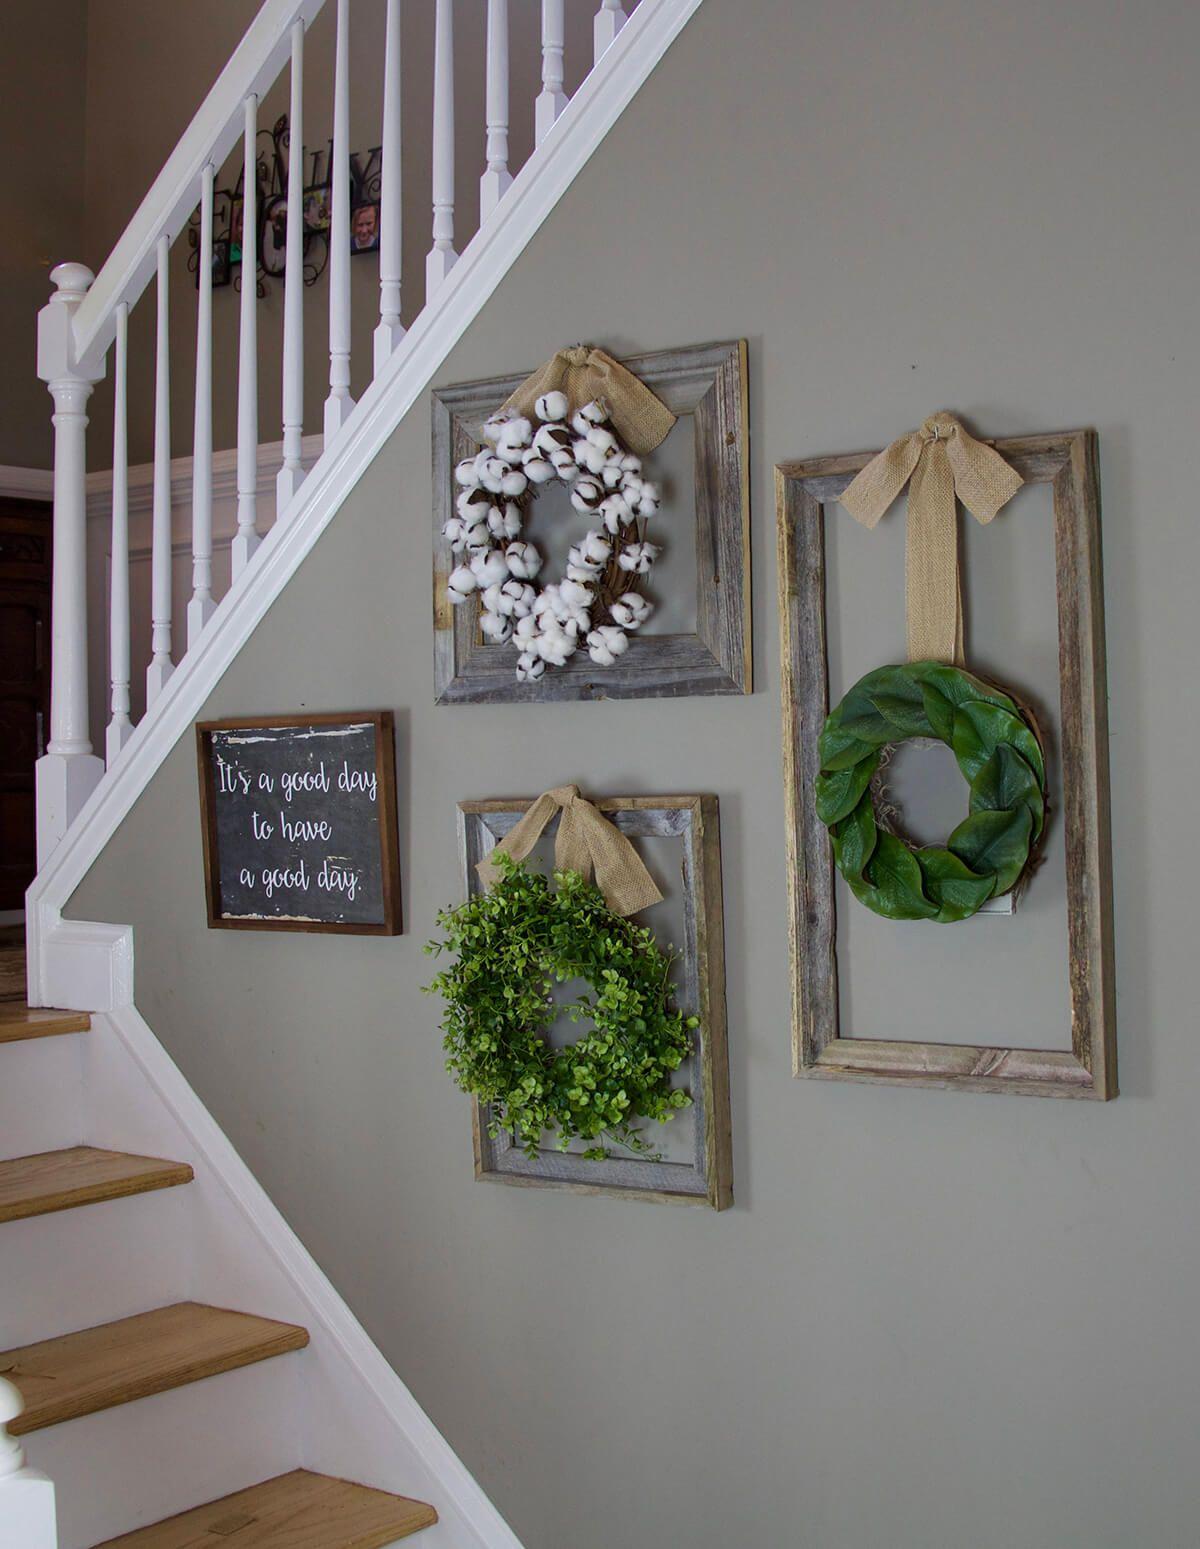 12 Elegant Decorating Ideas With Rustic Frames For True Farmhouse Charm Farmhouse Wall Decor Gallery Wall Decor Rustic Wall Decor